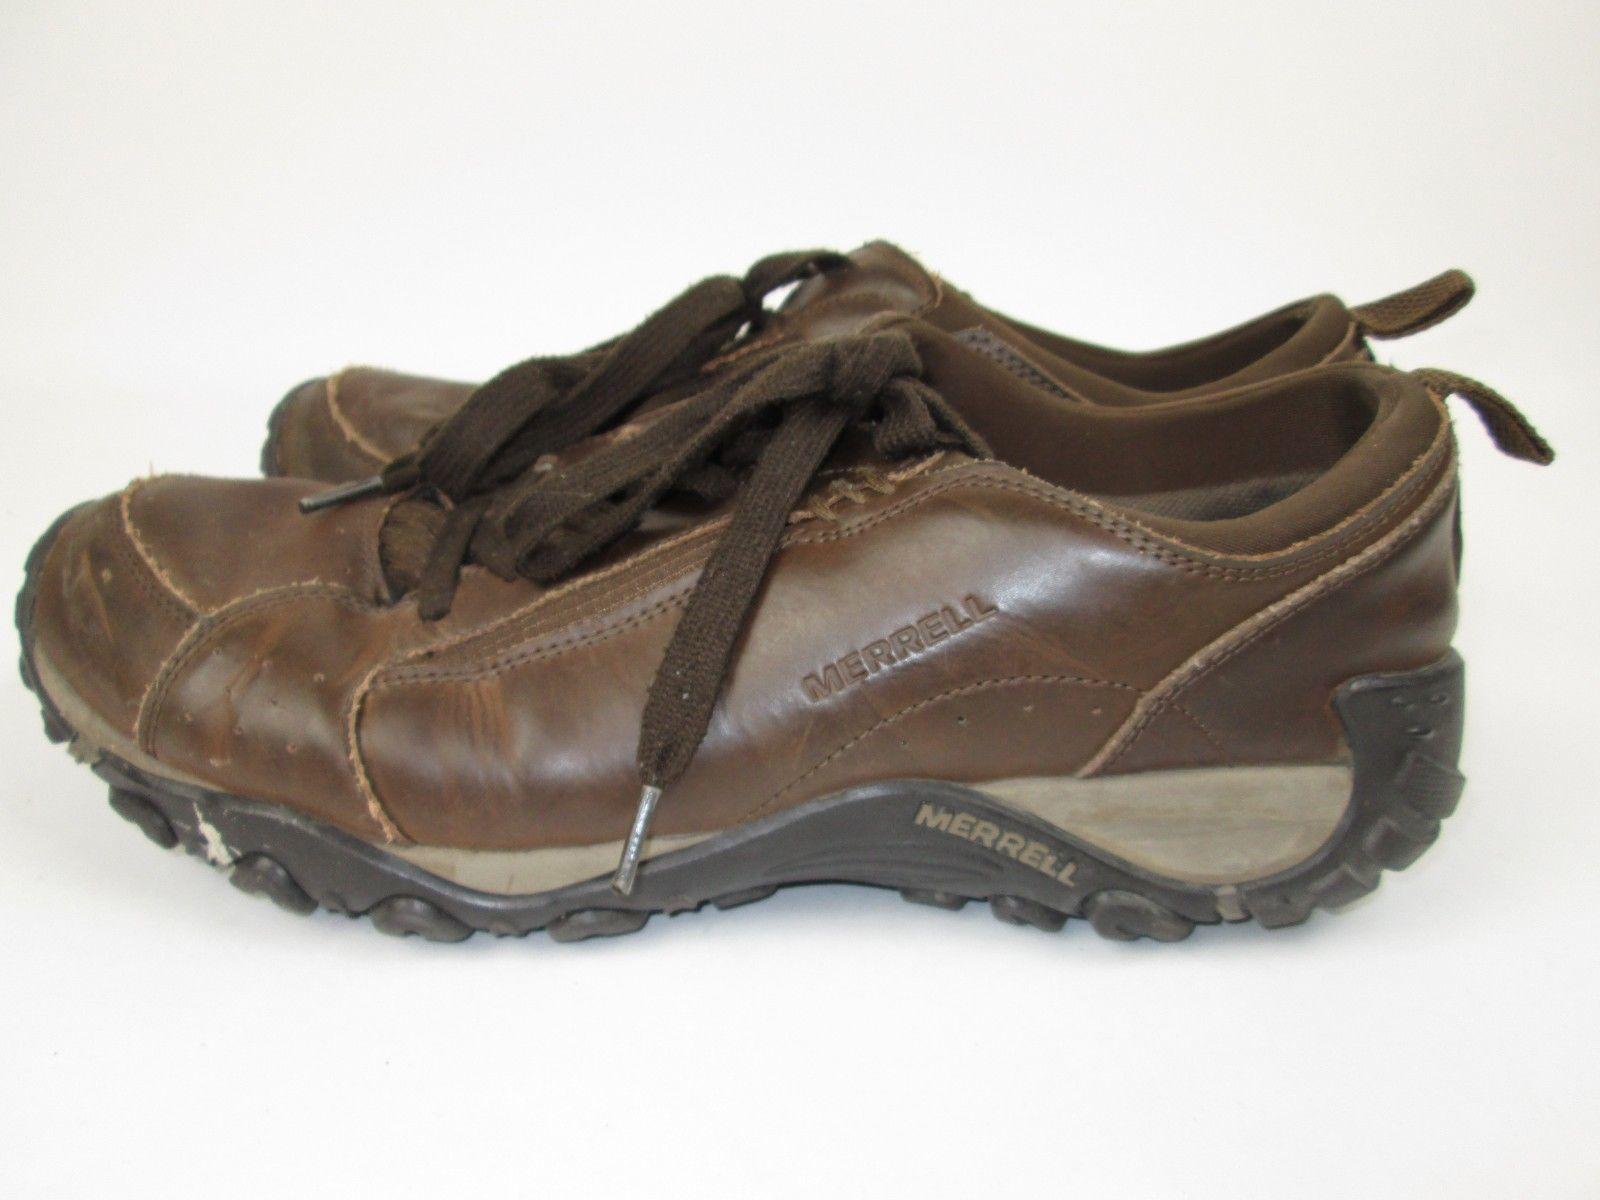 90946c2de1fe Merrell Men s Dark Earth Performance Shoe and 50 similar items. 57